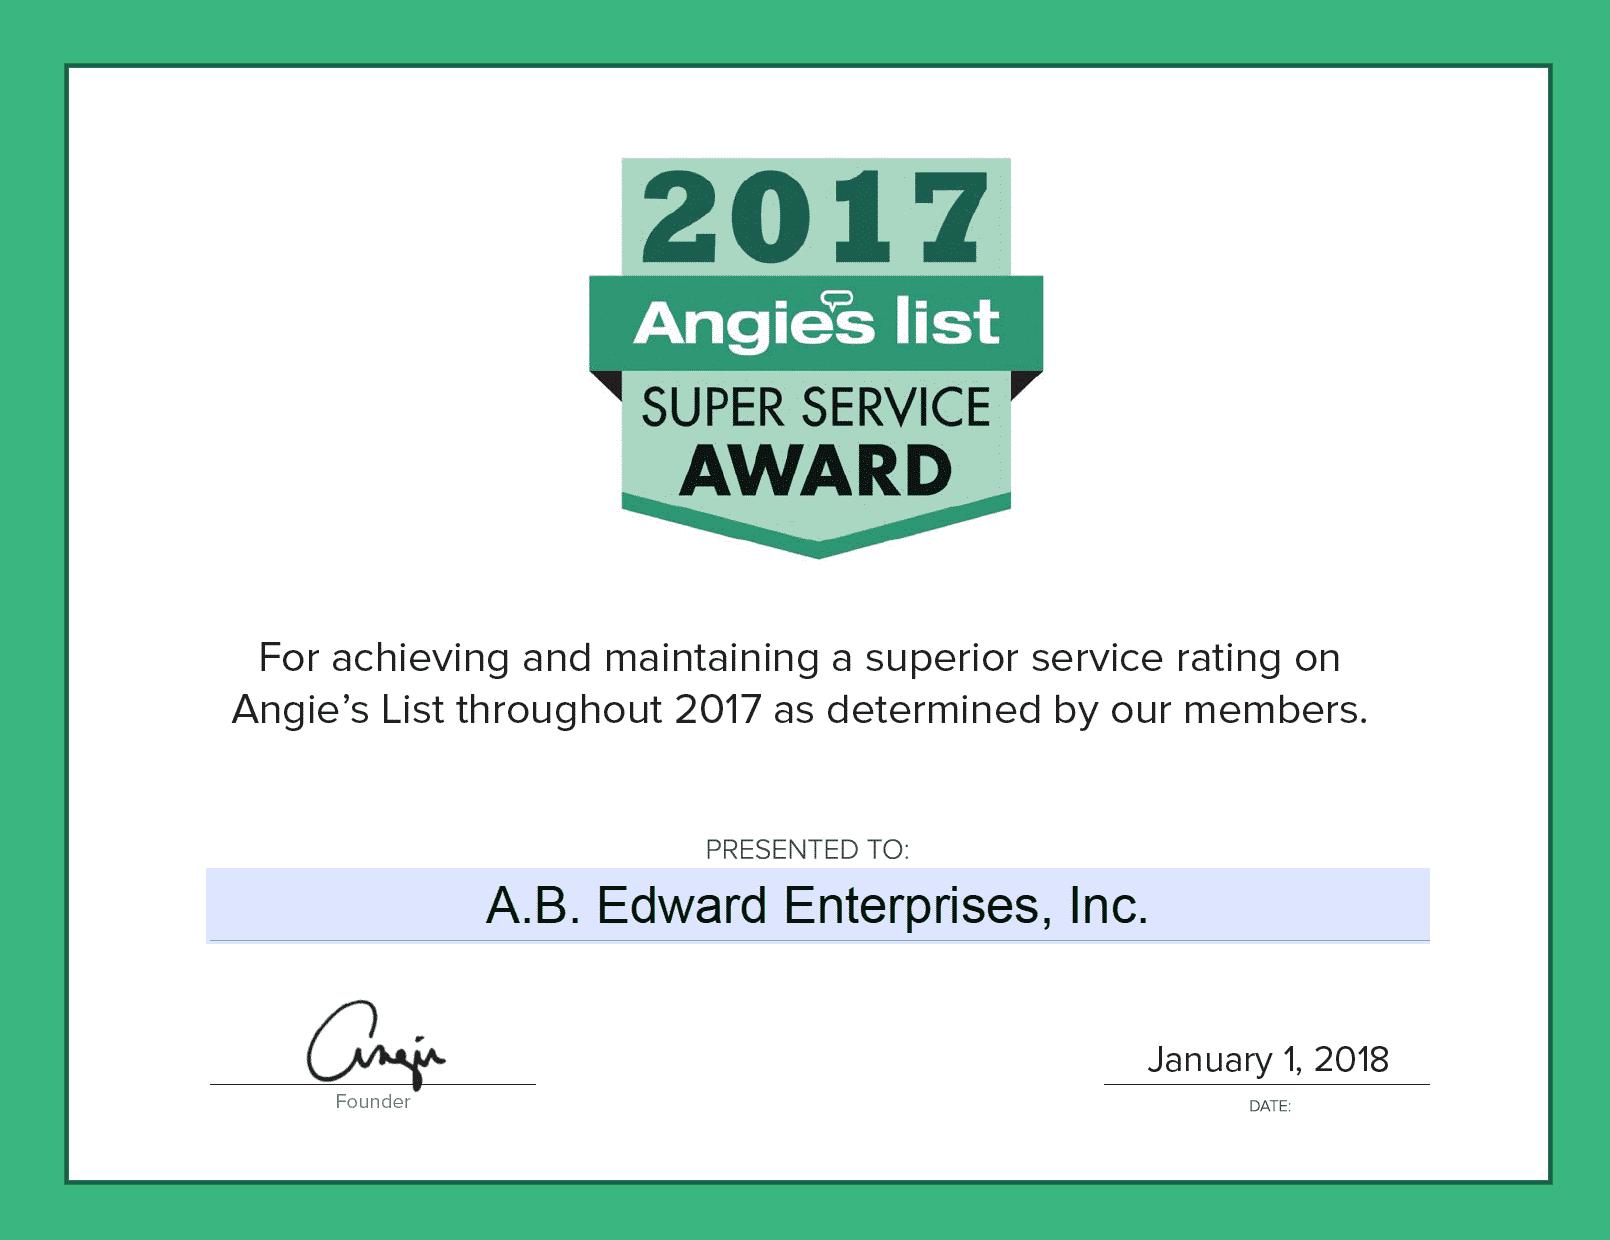 A.B. Edward Earns Esteemed 2017 Angies List Super Service Award